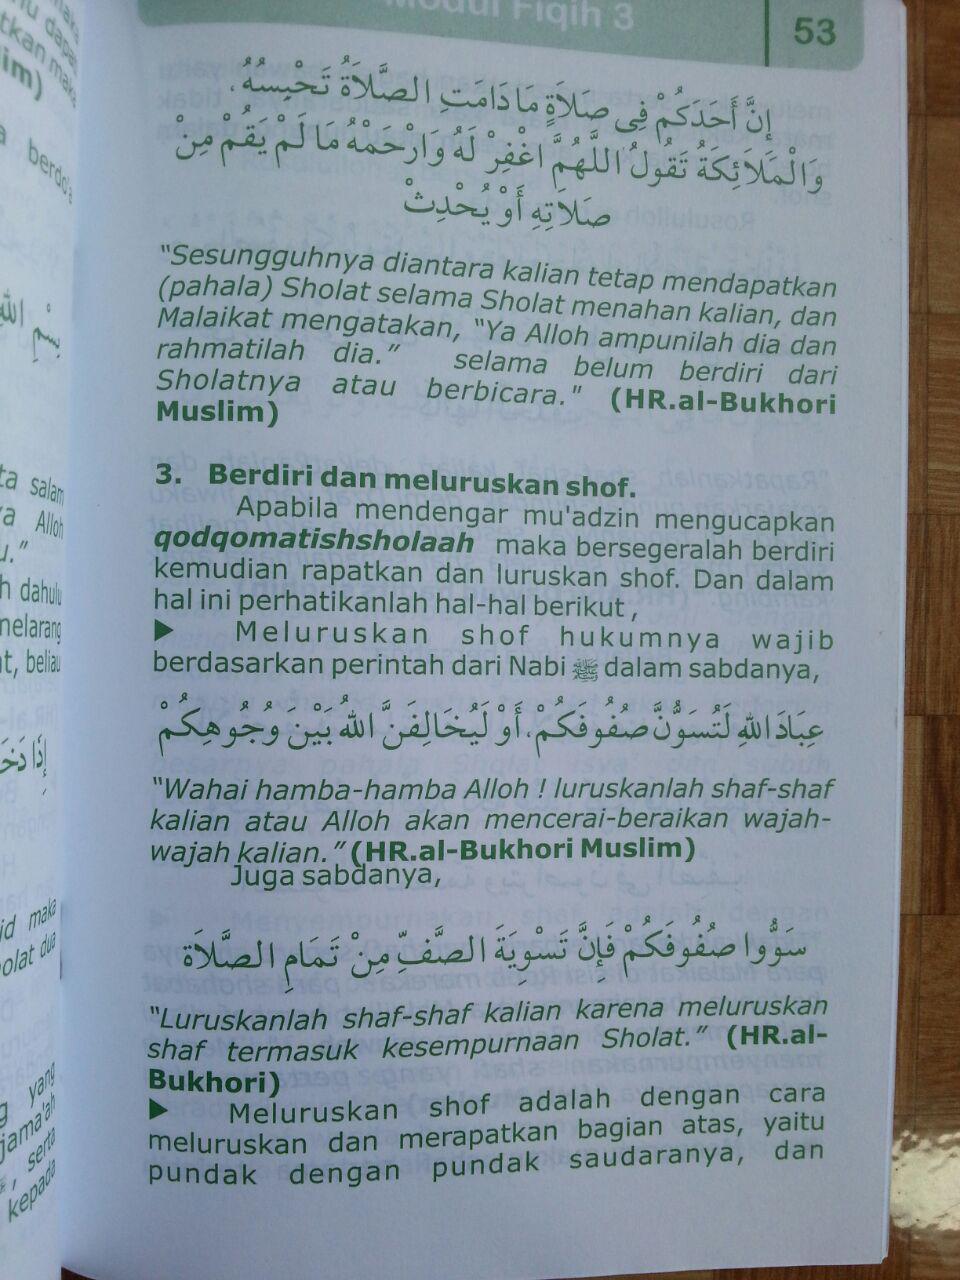 Buku Pegangan Pengajaran Anak Islam Modul Fiqih 3 isi 3